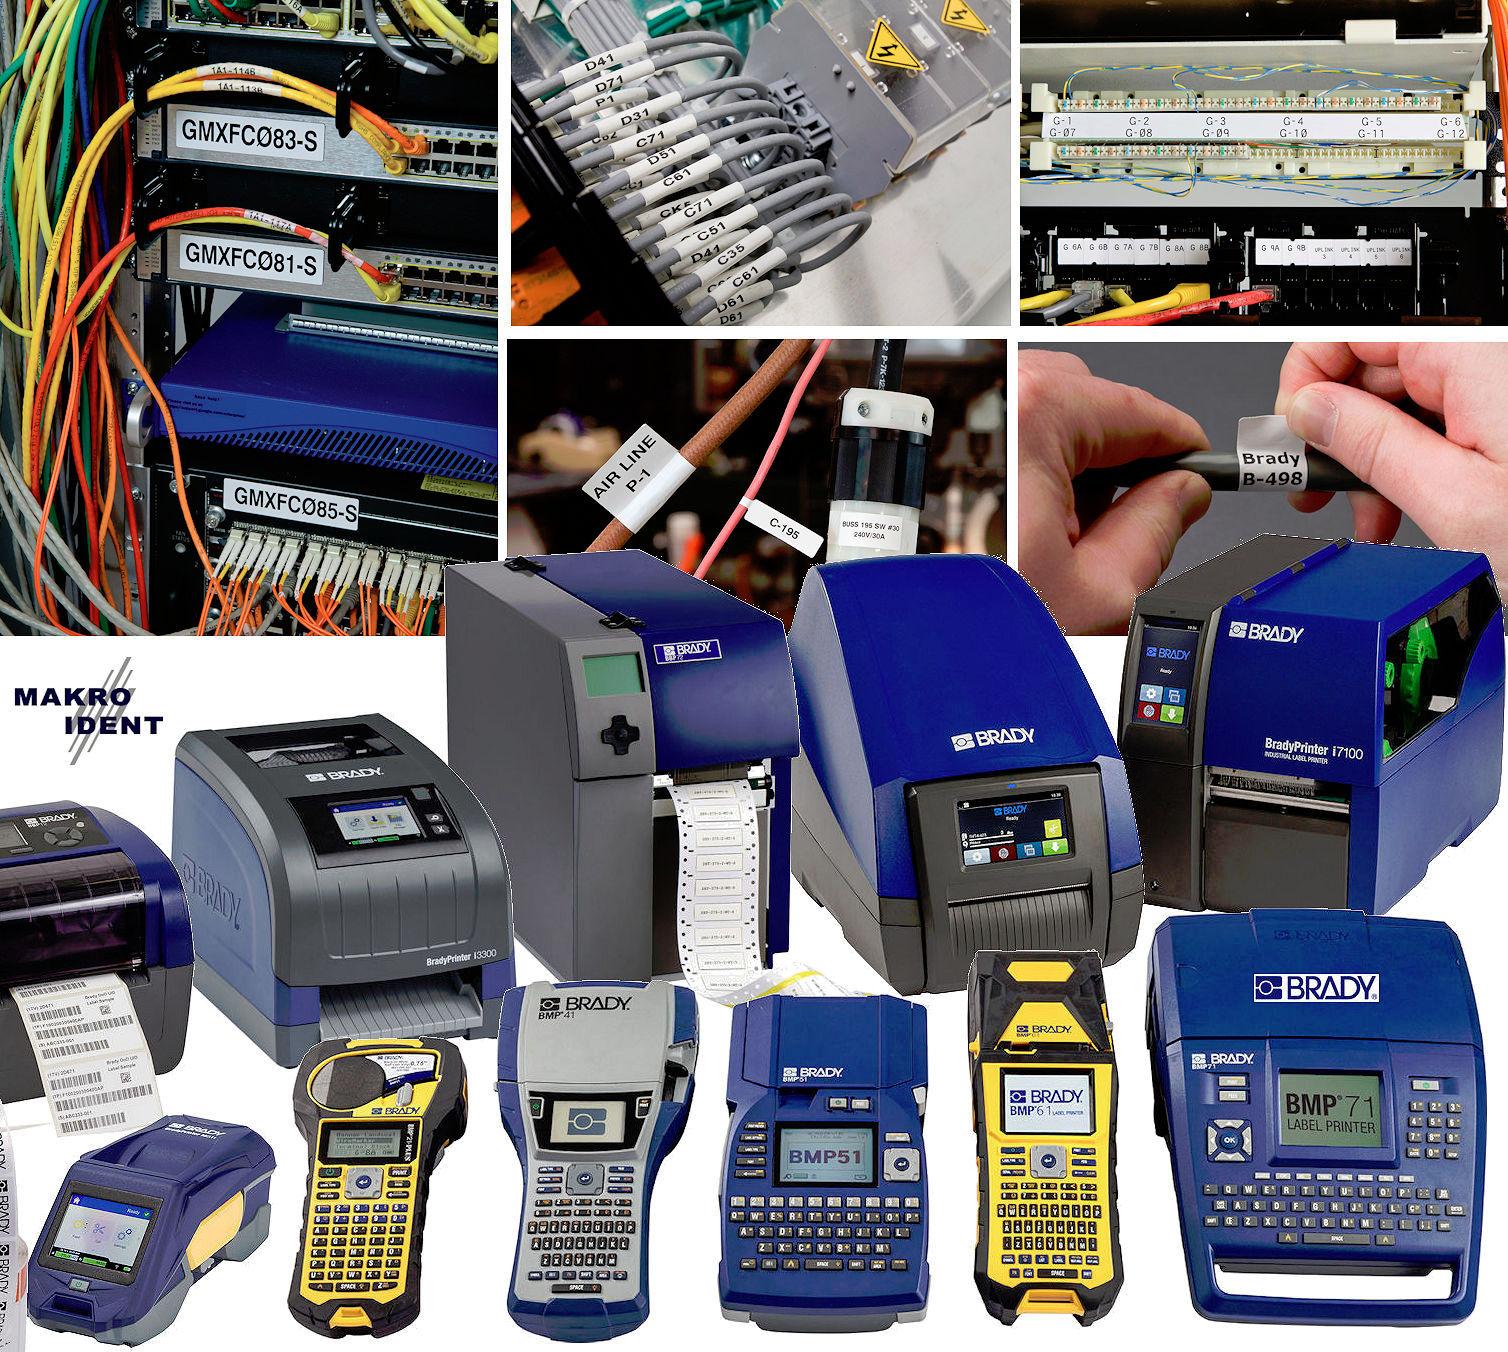 kabelbeschriftung Zuverlässige Kabelbeschriftung und passende, robuste Beschriftungsgeräte